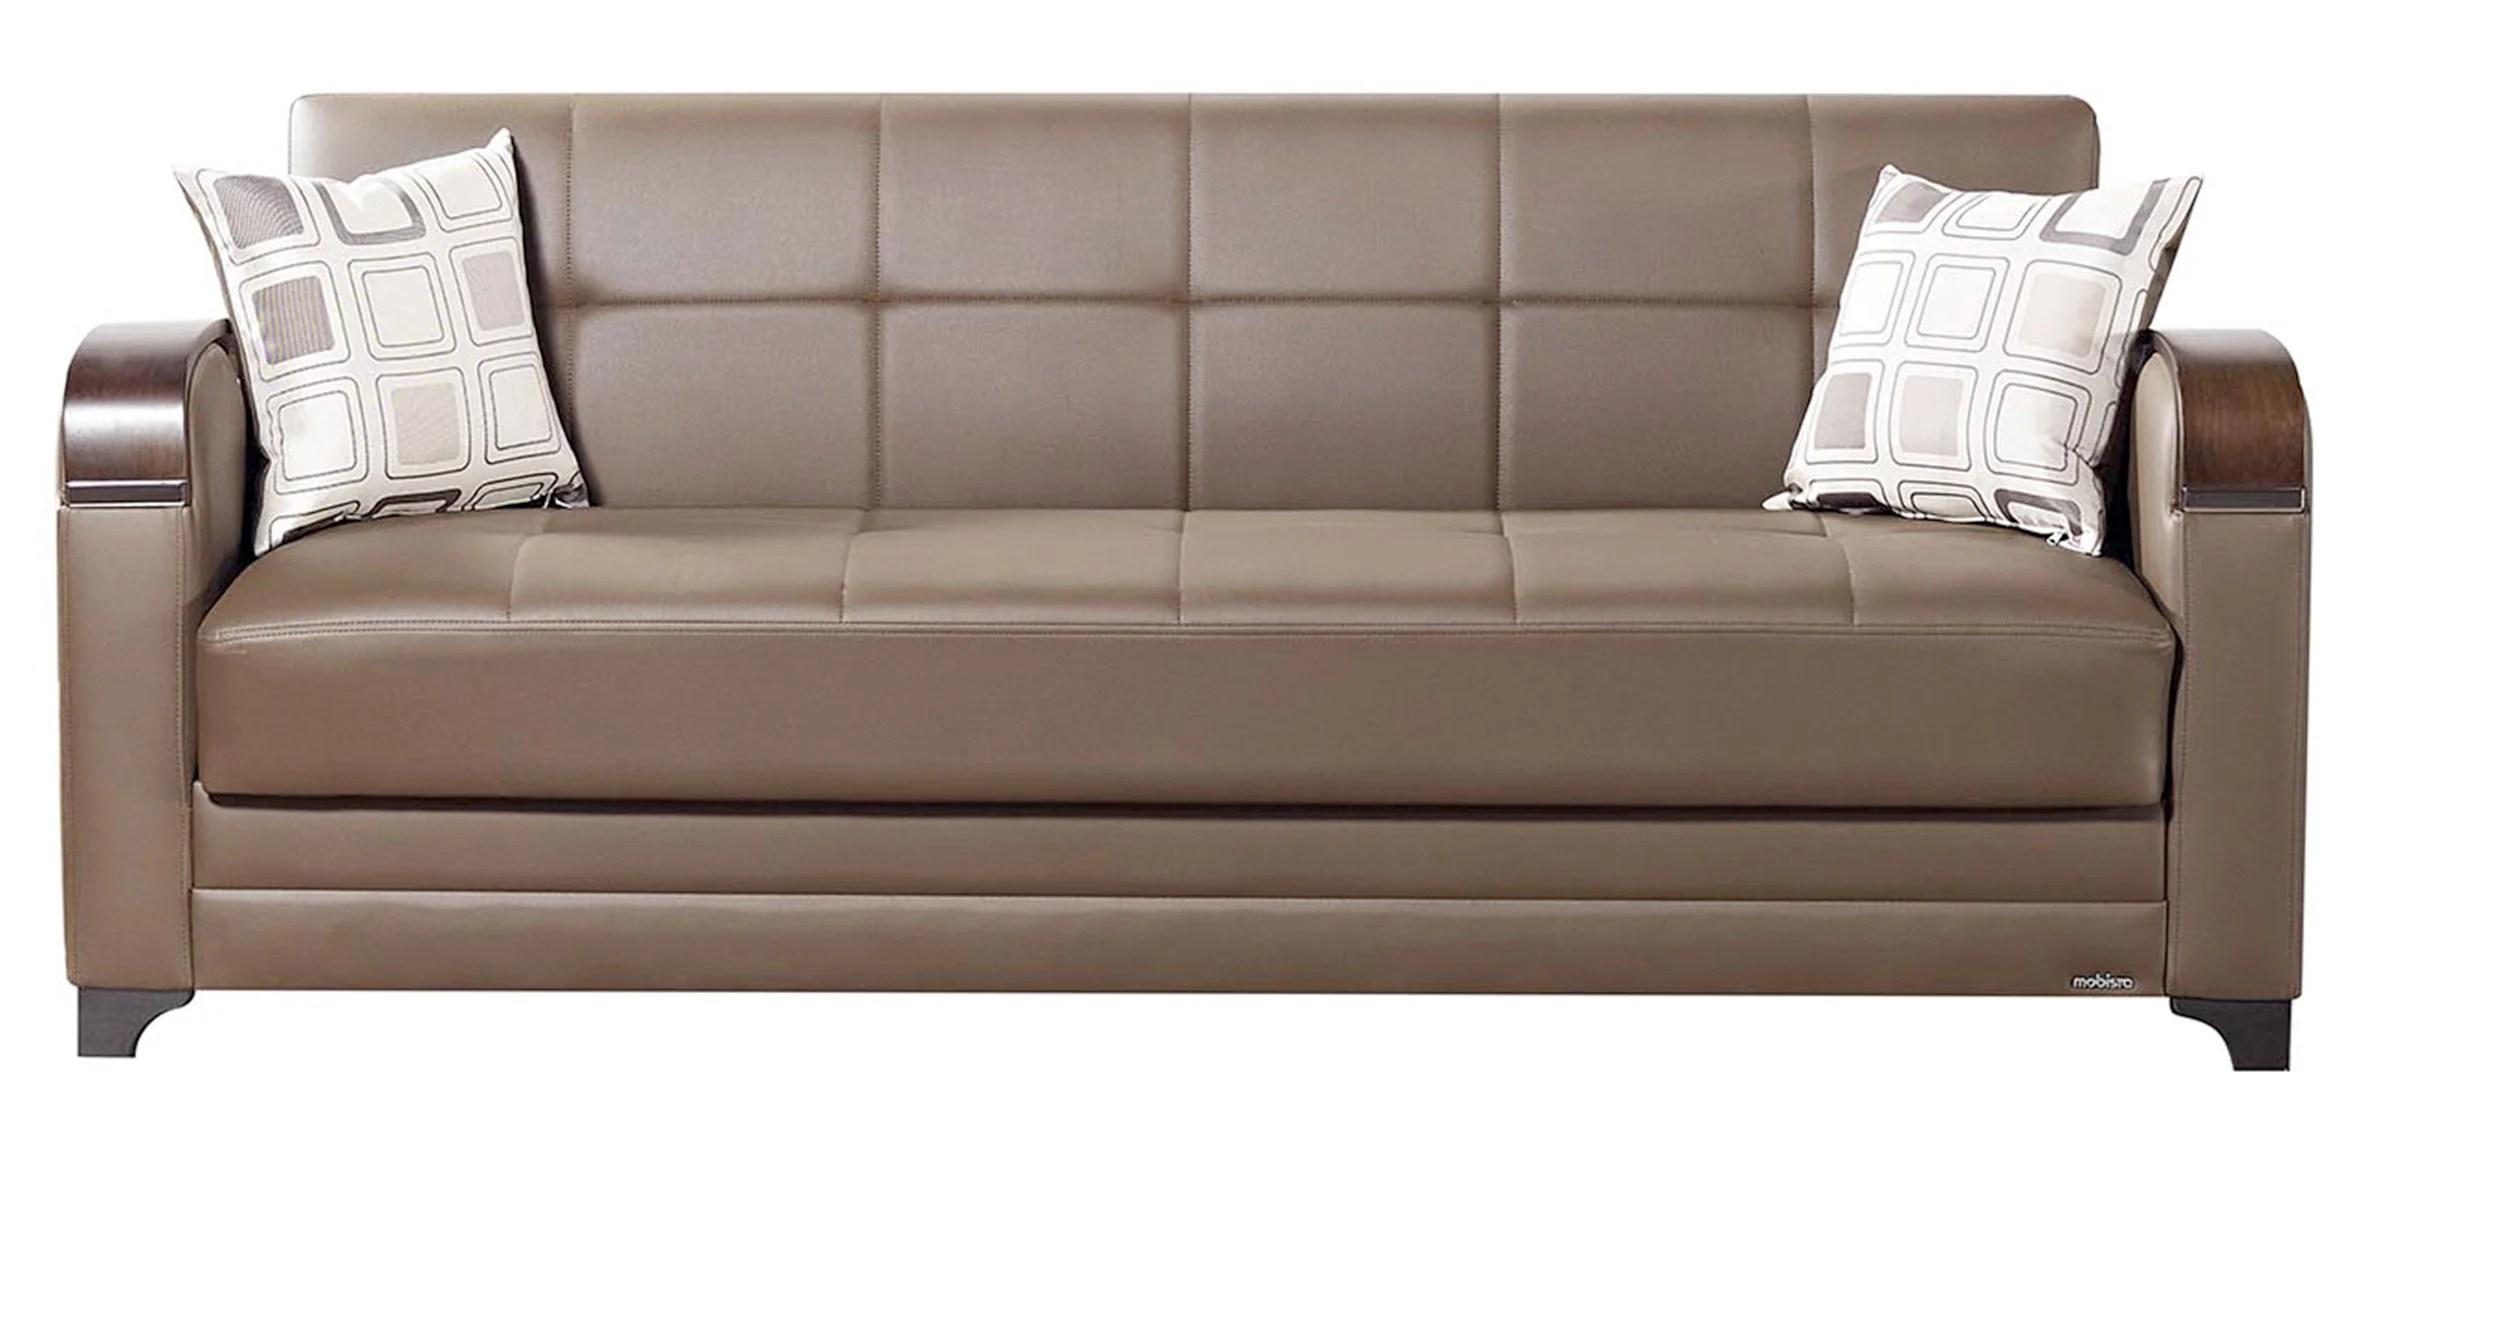 faux leather sofa india eames 3 seat replica leatherette bed dark brown futon